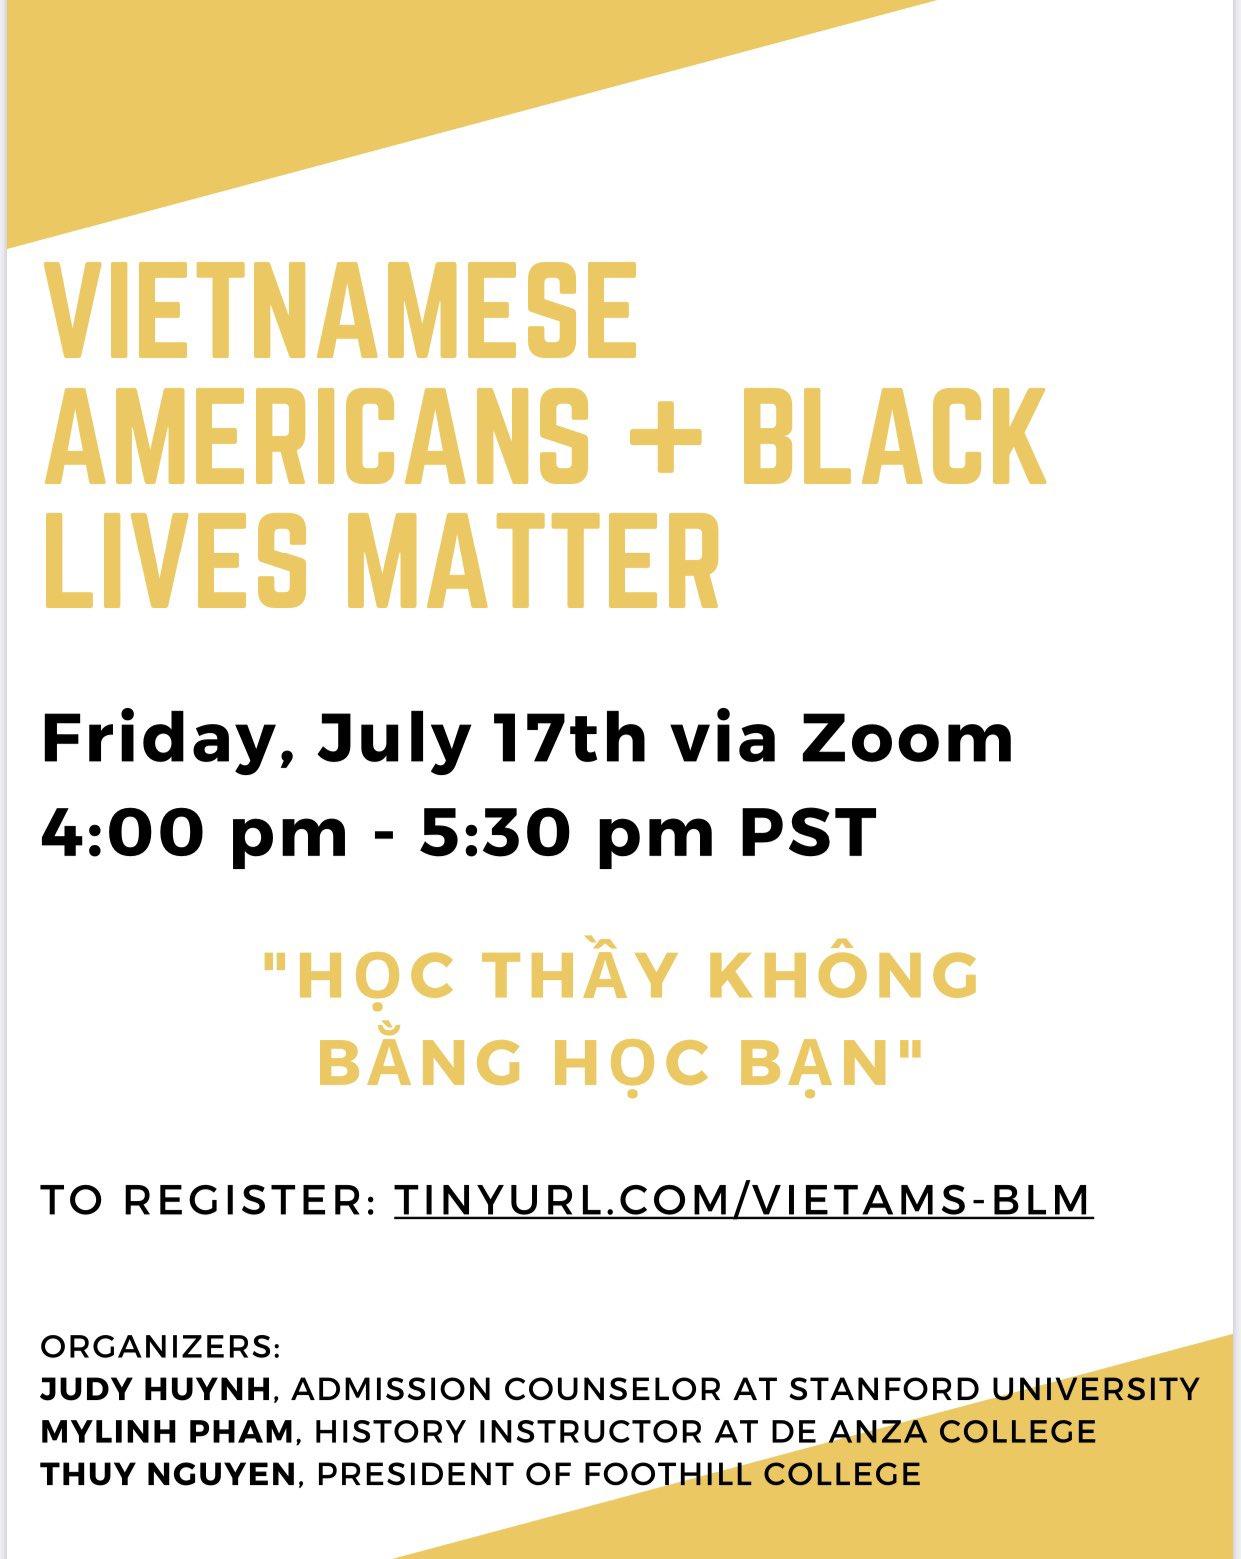 Vietnamese Americans + Black Lives Matter